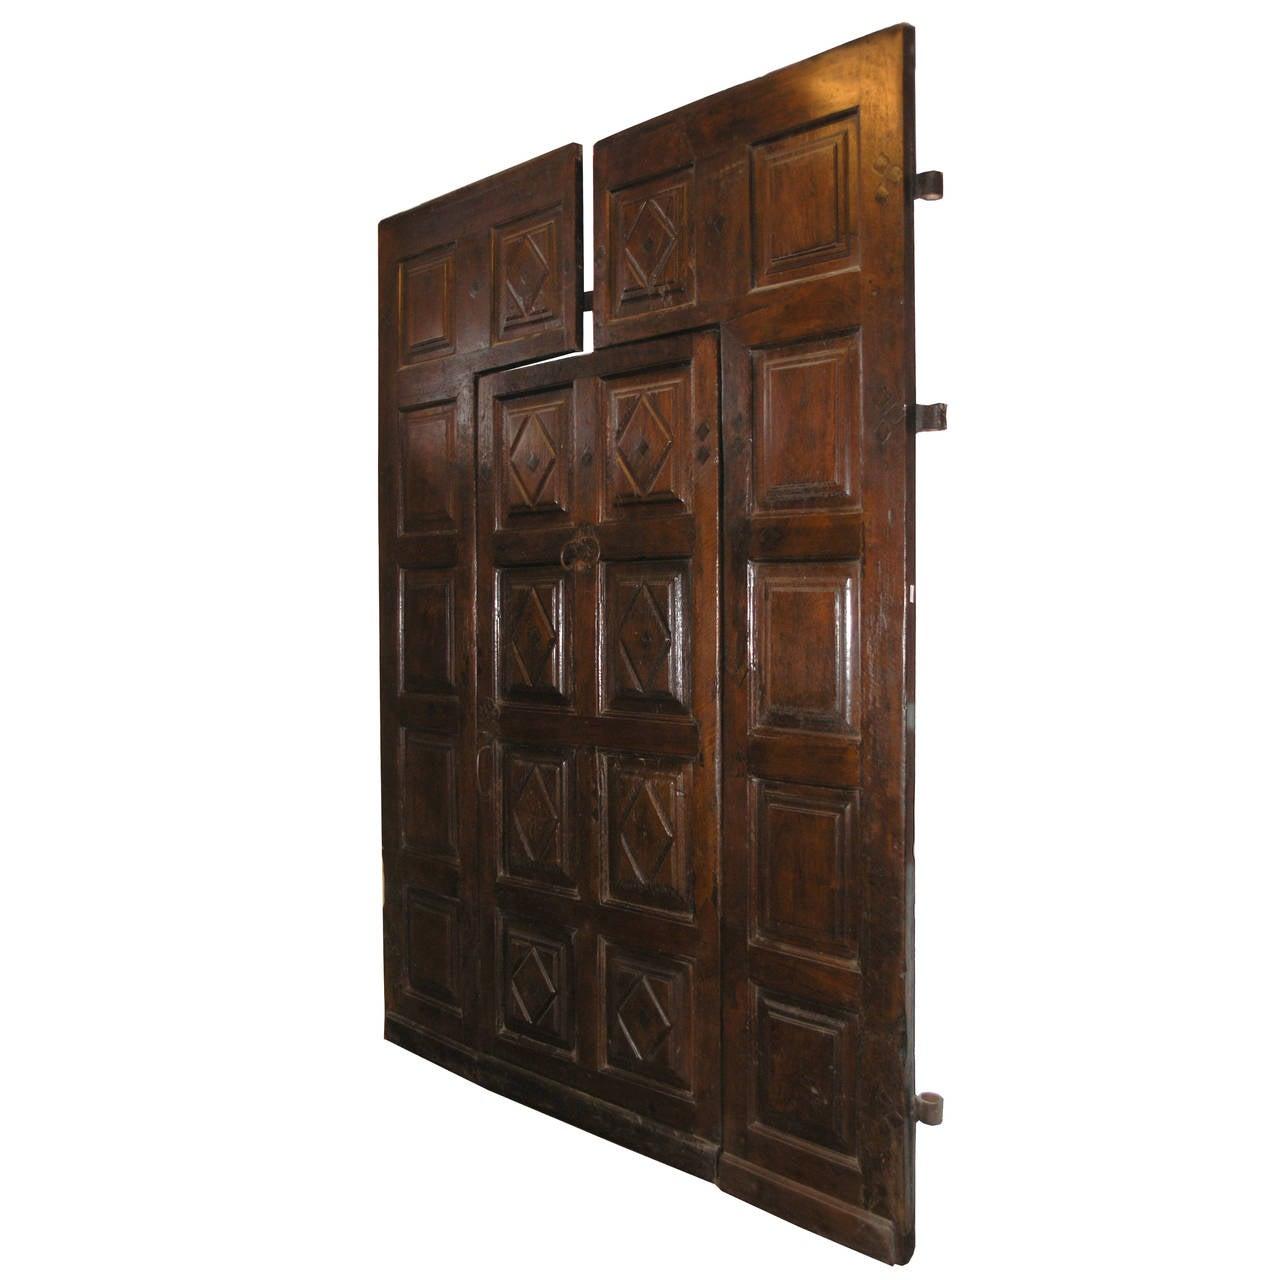 1280 #A0662B Antique Walnut Entry Door At 1stdibs save image Vintage Exterior Doors 41071280